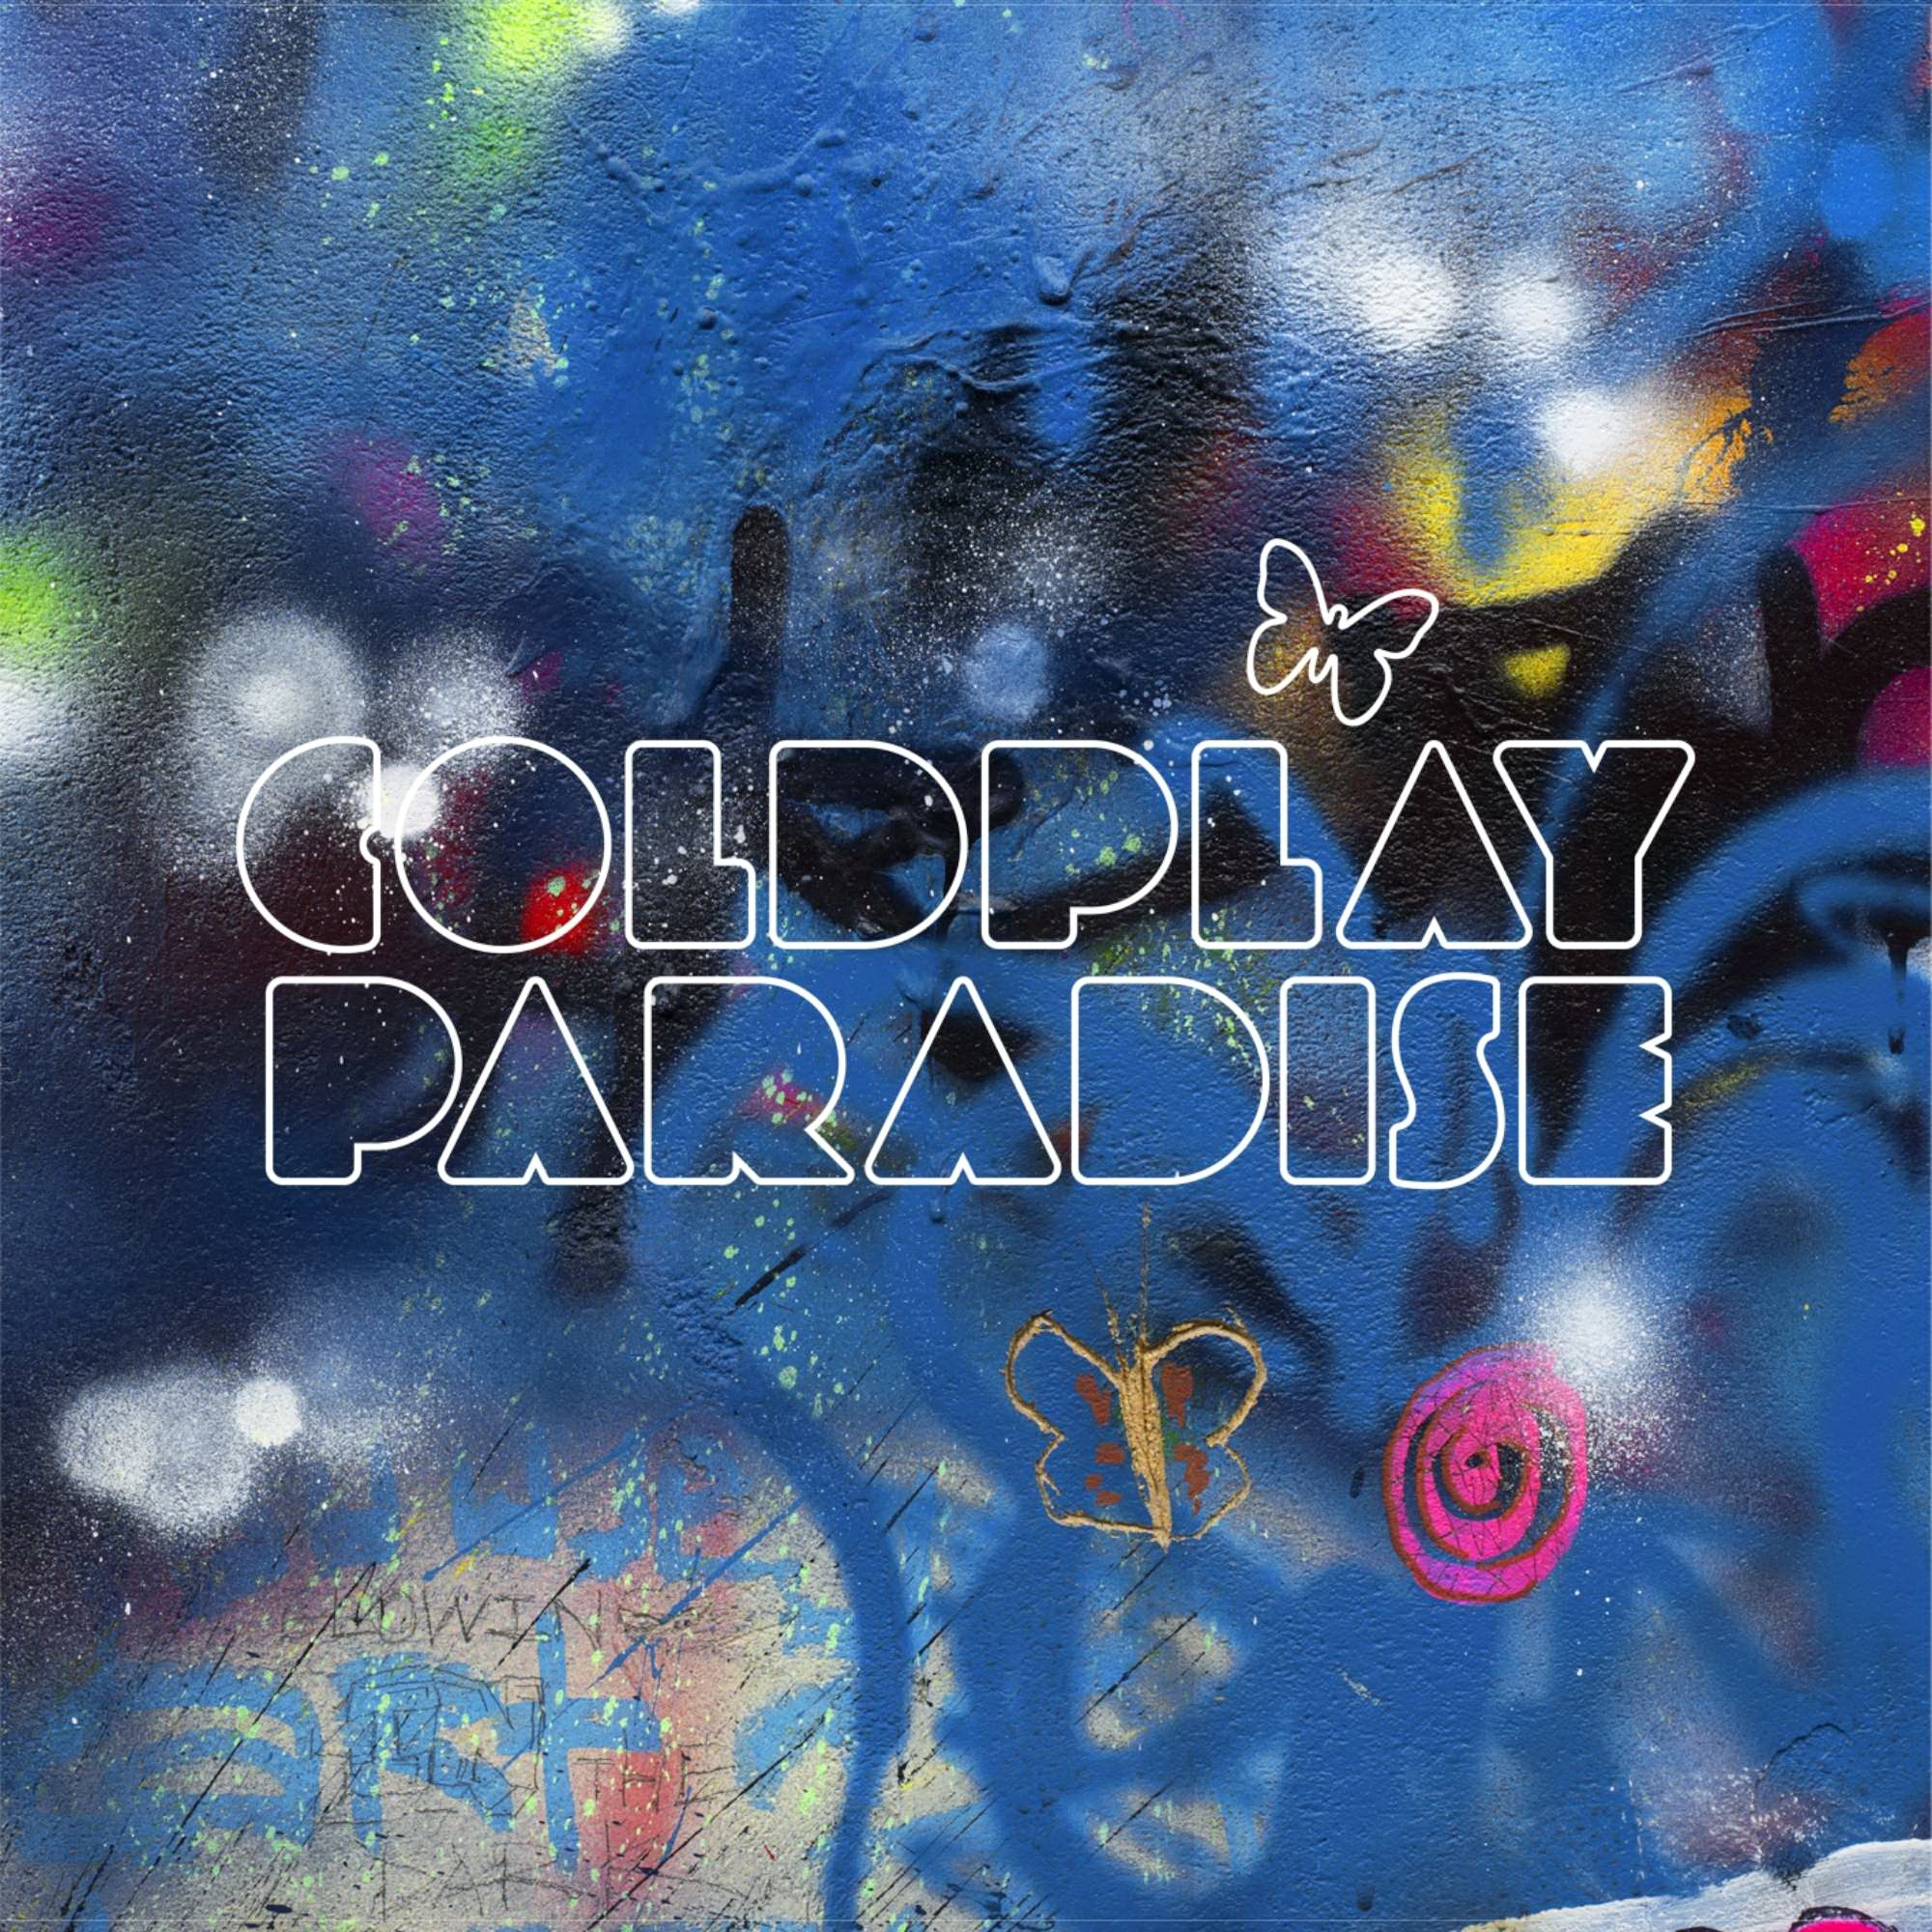 Coldplay - Paradise (CD Single Promo) (2011)  mp3 -320 Kbps